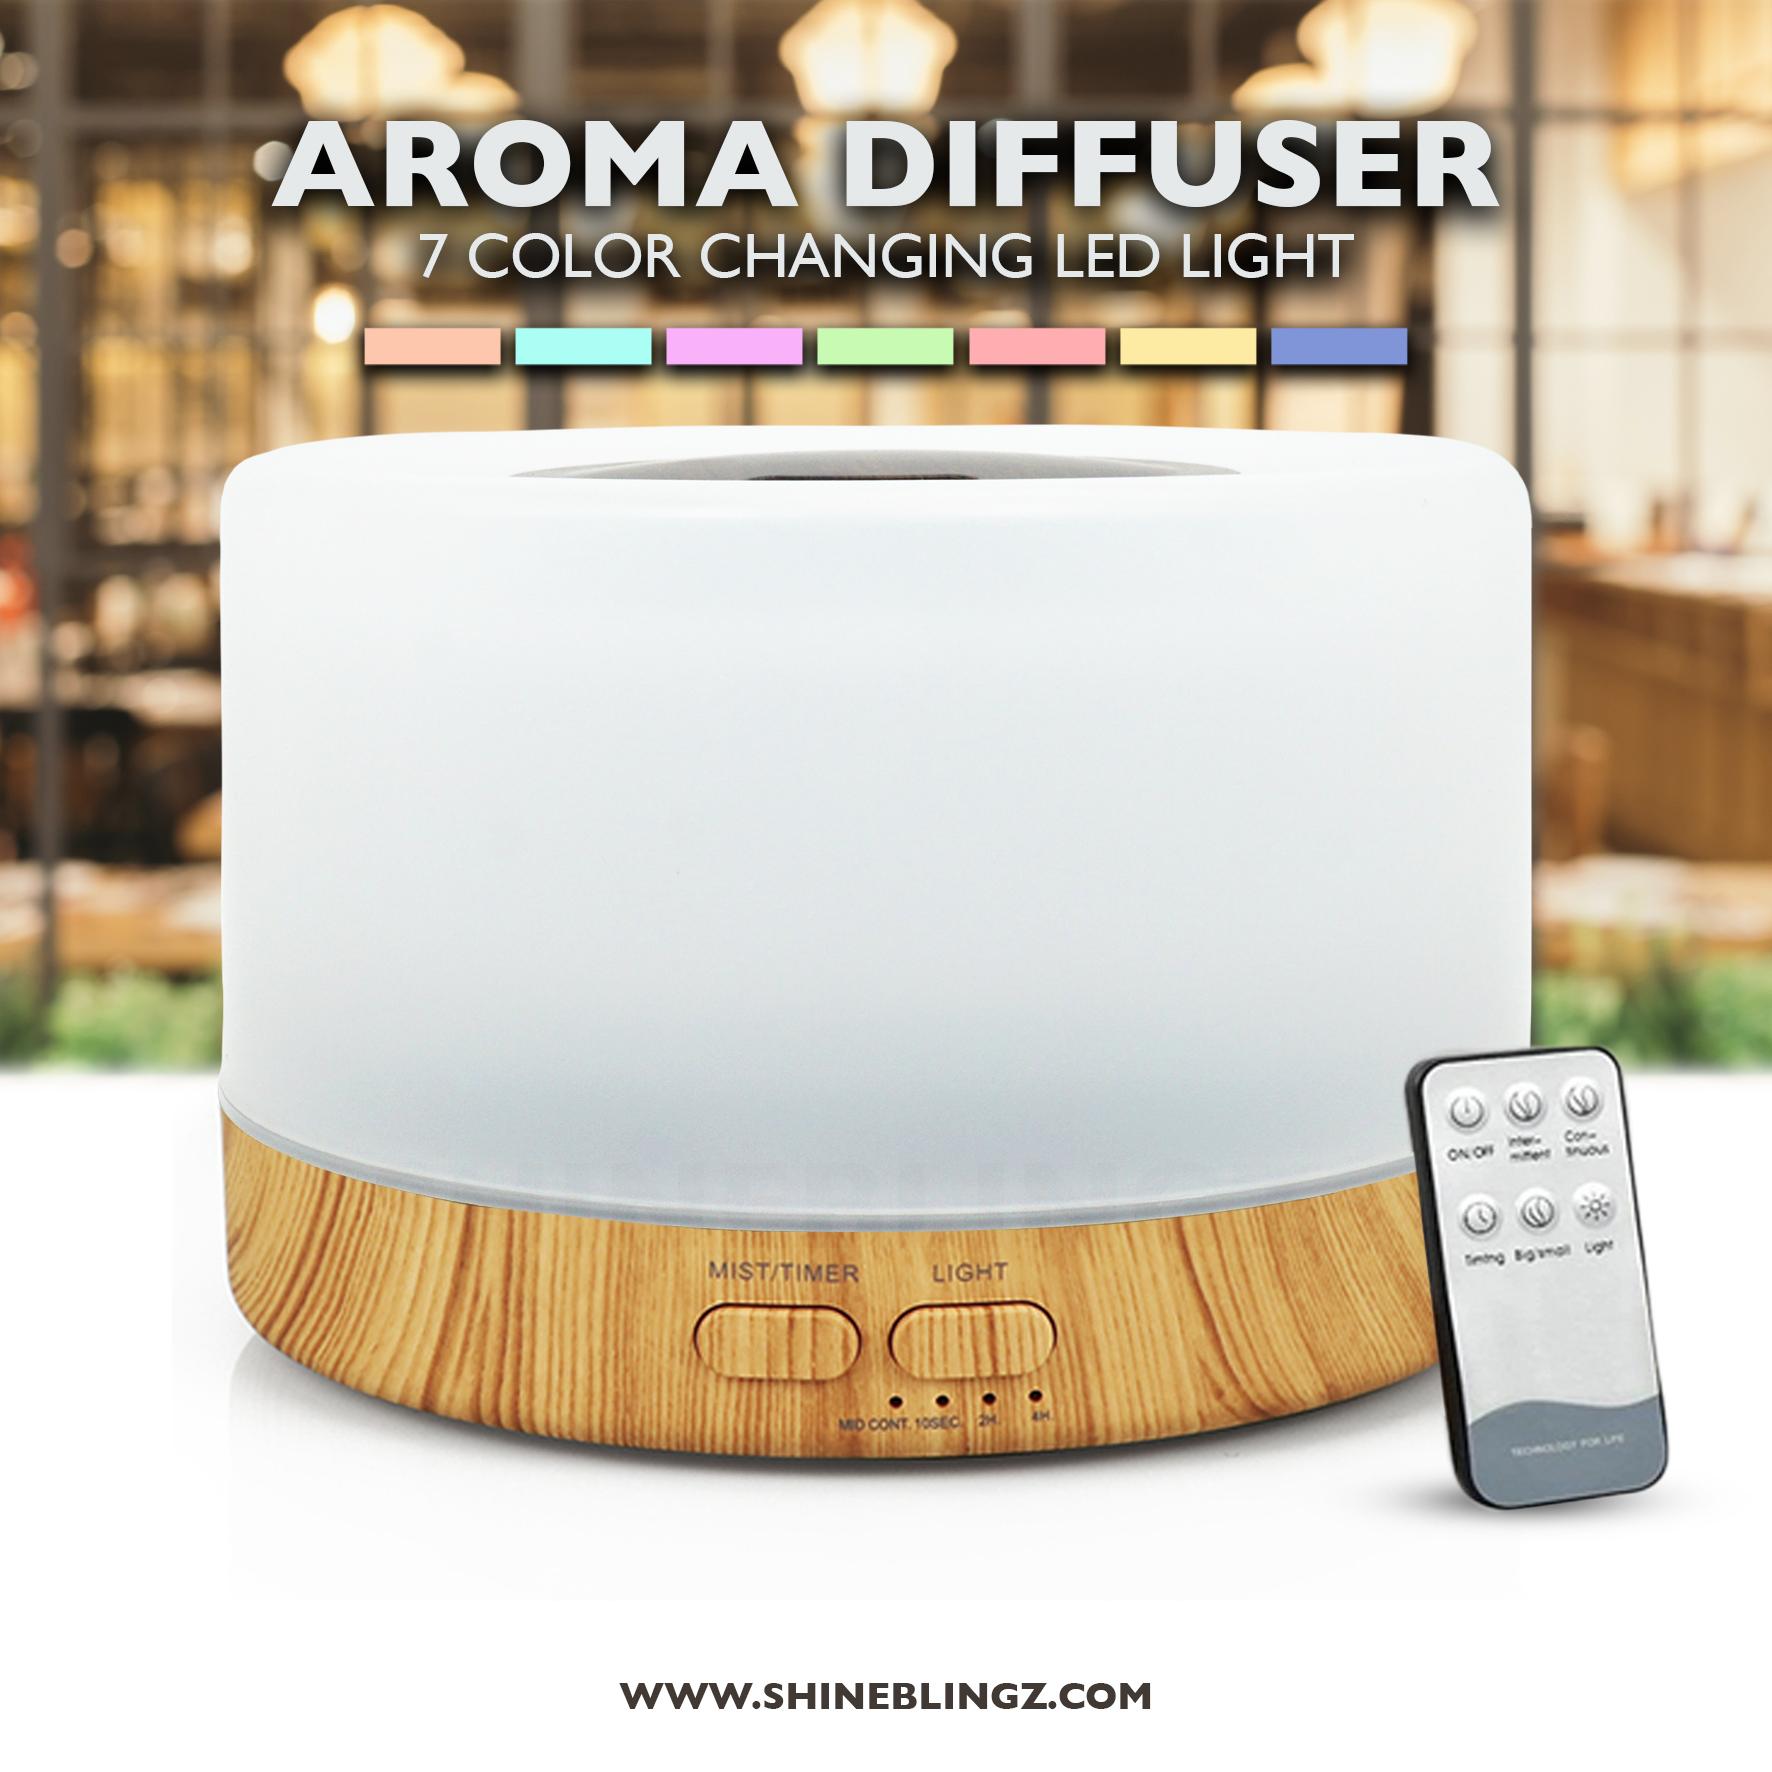 aroma diffuser2.jpg